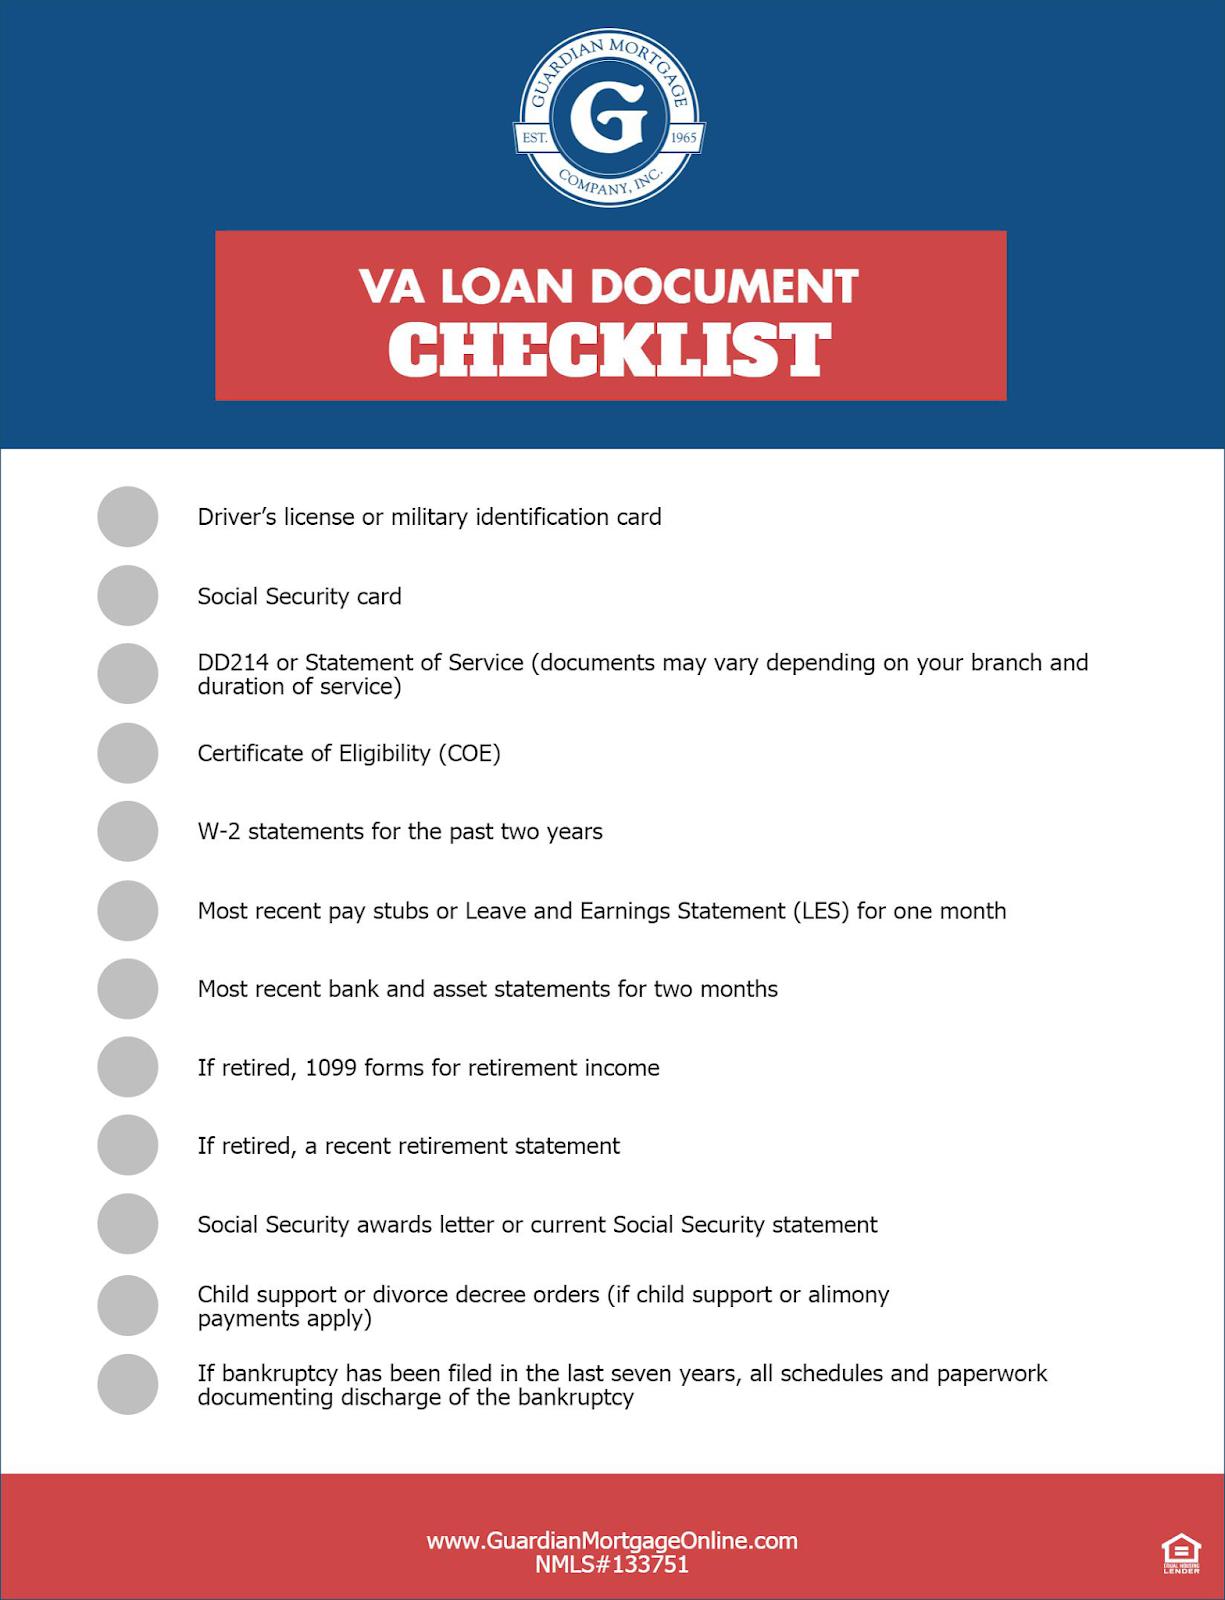 https://www.mylouisvillekentuckymortgage.com/p/va-loans.html